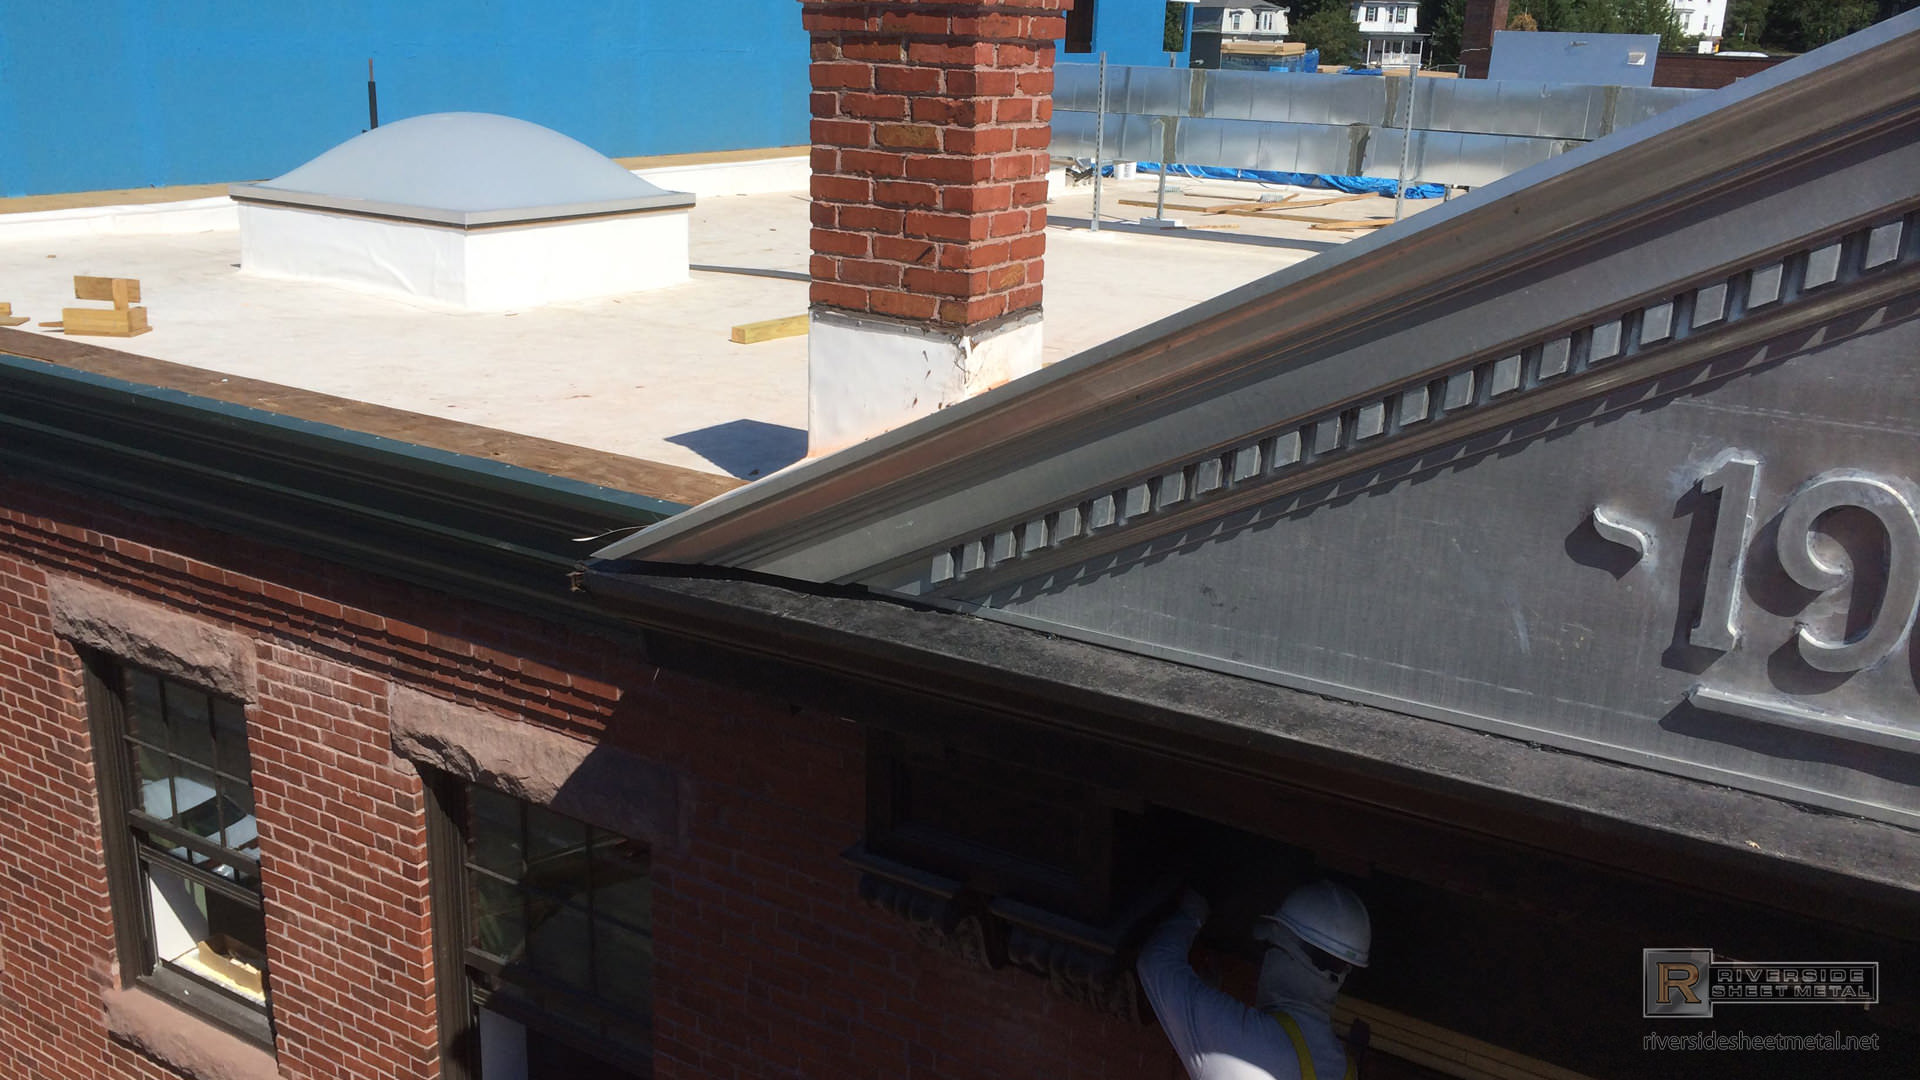 Cornice Edge Metal For Roofing Copper Aluminum